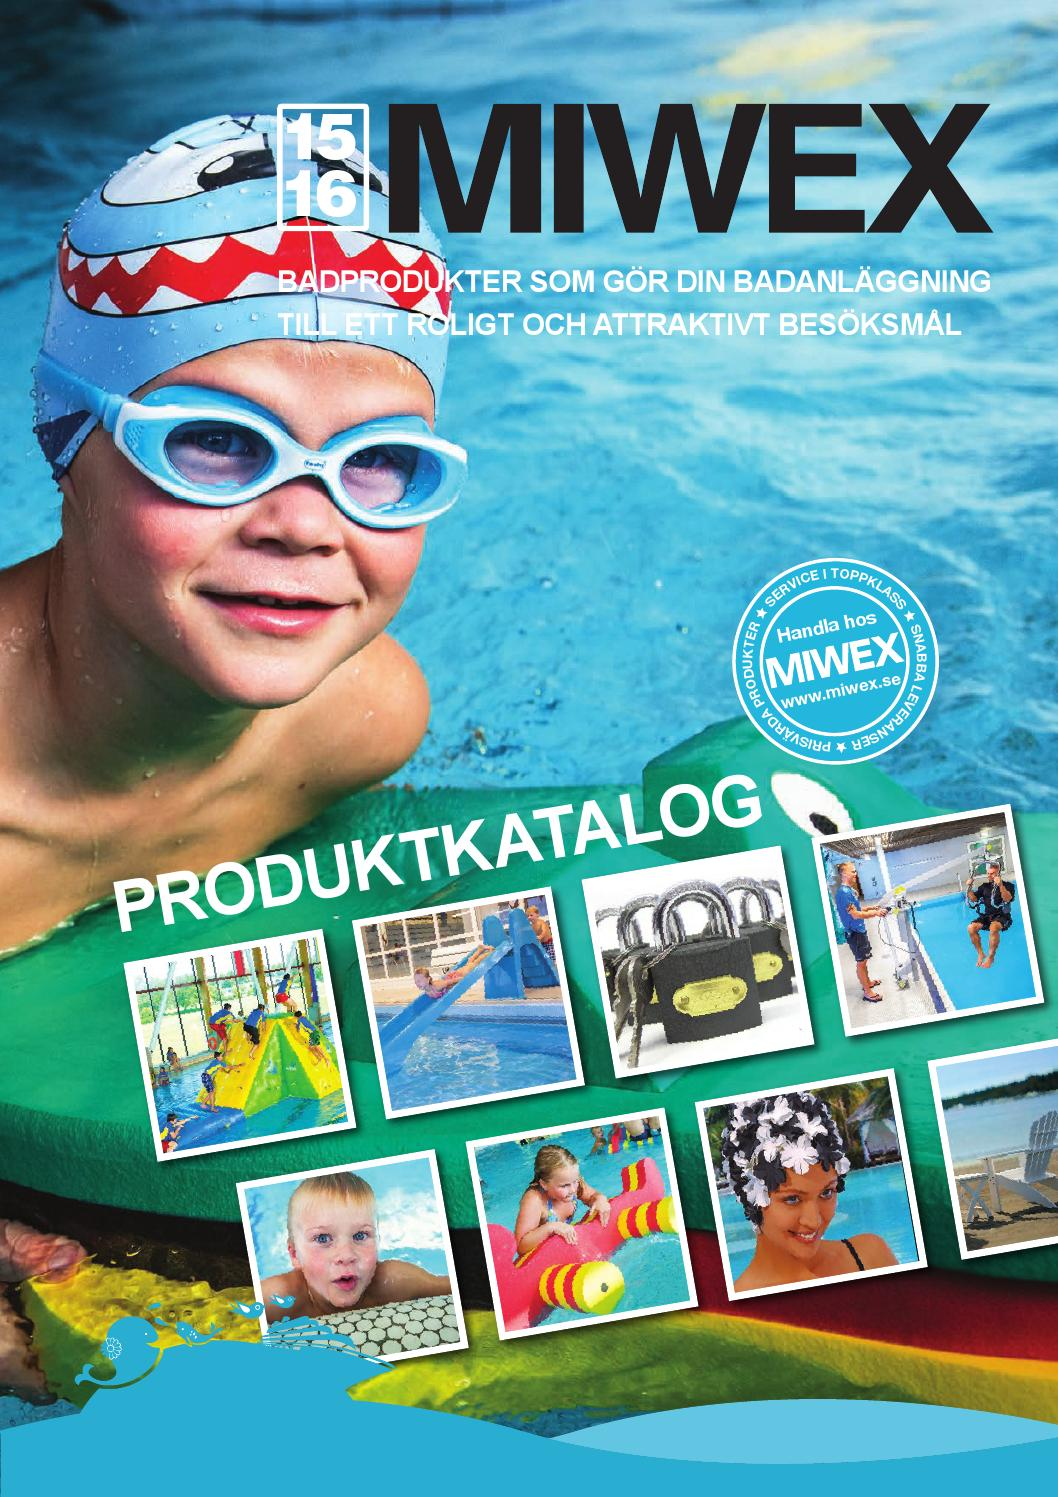 Produktkatalog 15-16 by Miwex - issuu f2eb8974de65f